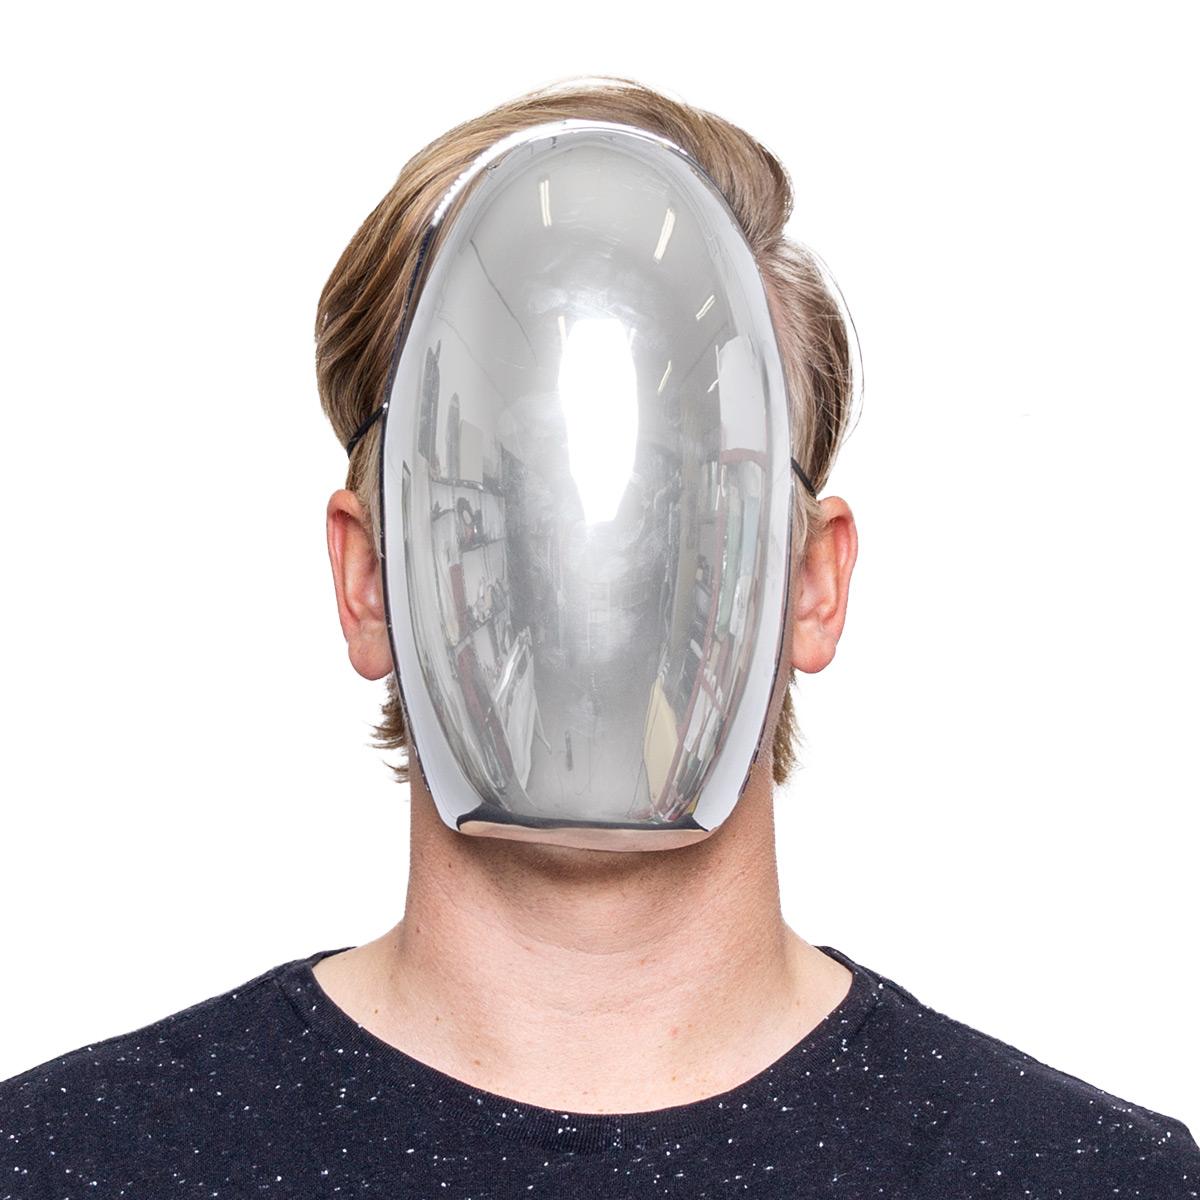 Mask, metall spegel